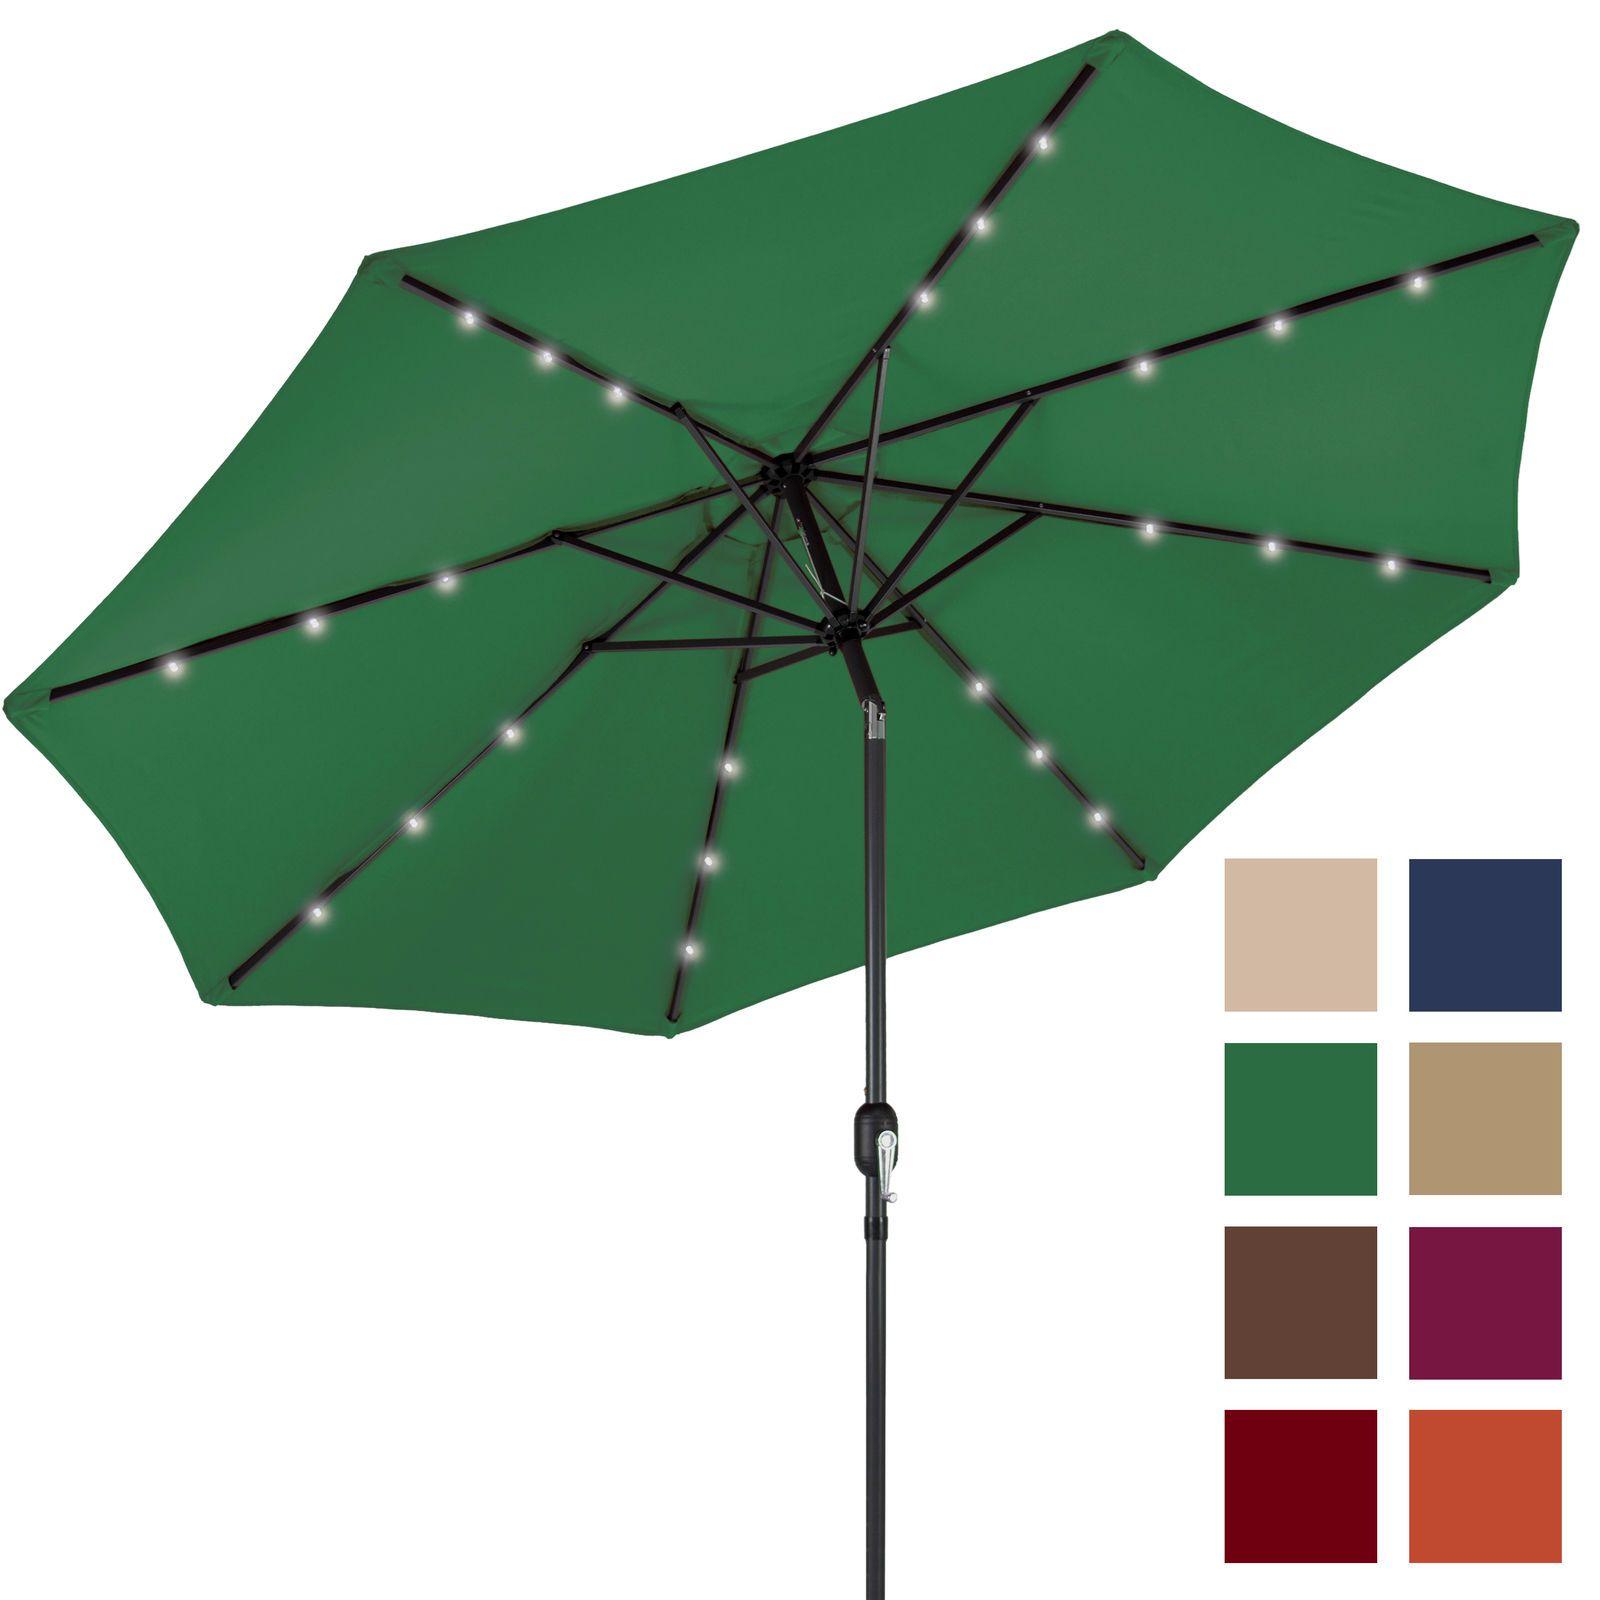 2018 Bcp 10ft Deluxe Solar Led Lighted Patio Umbrella W/ Tilt ...